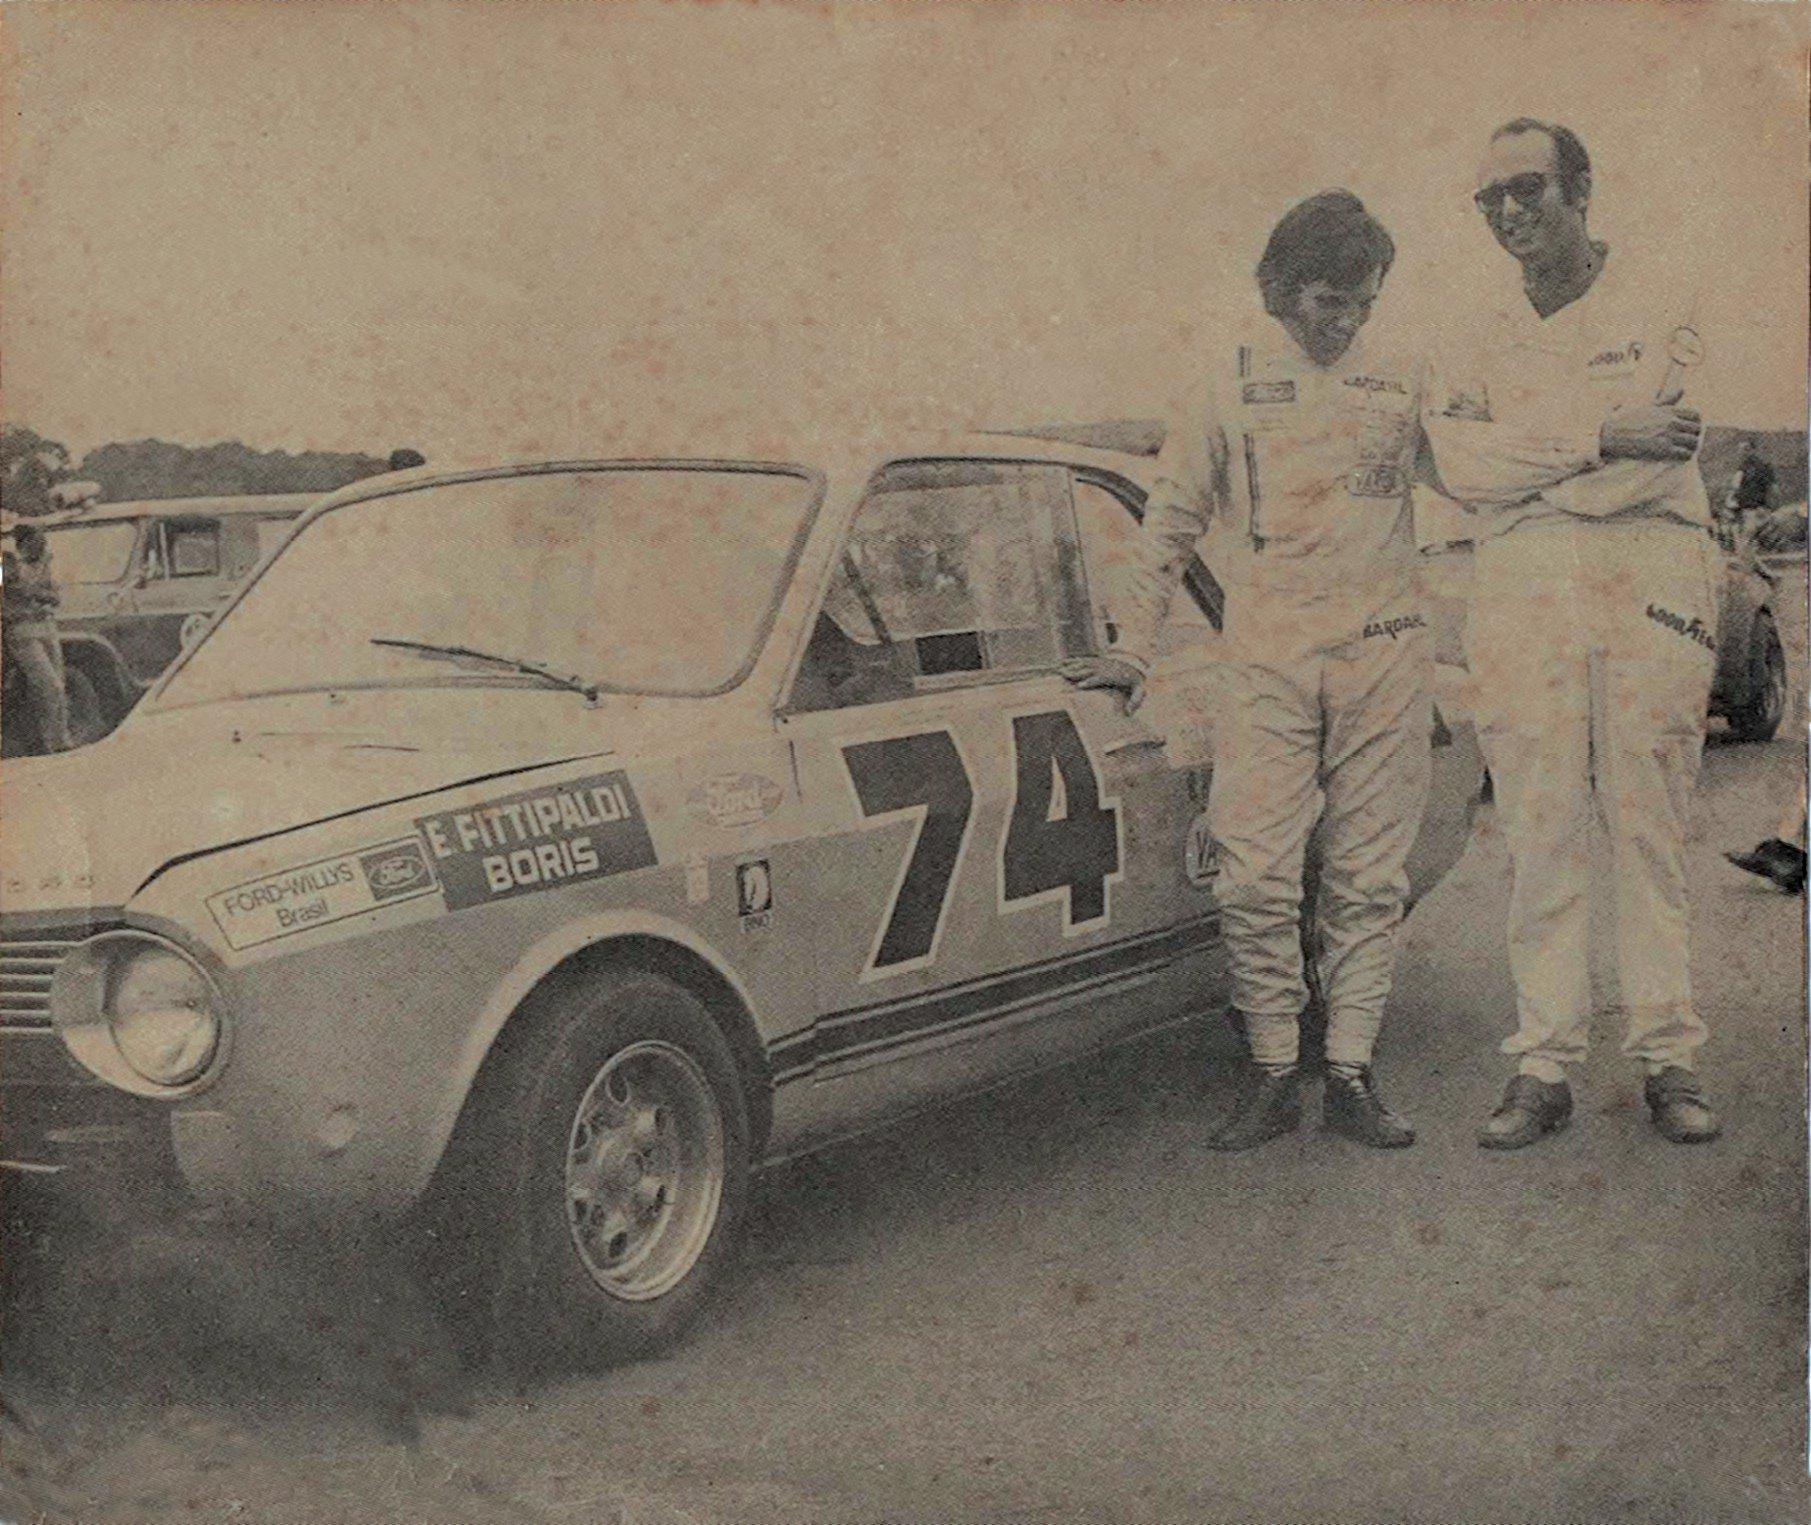 Boris Feldman (esq.) e Emerson Fittipaldi durante corrida em 1970 (Arquivo pessoal)